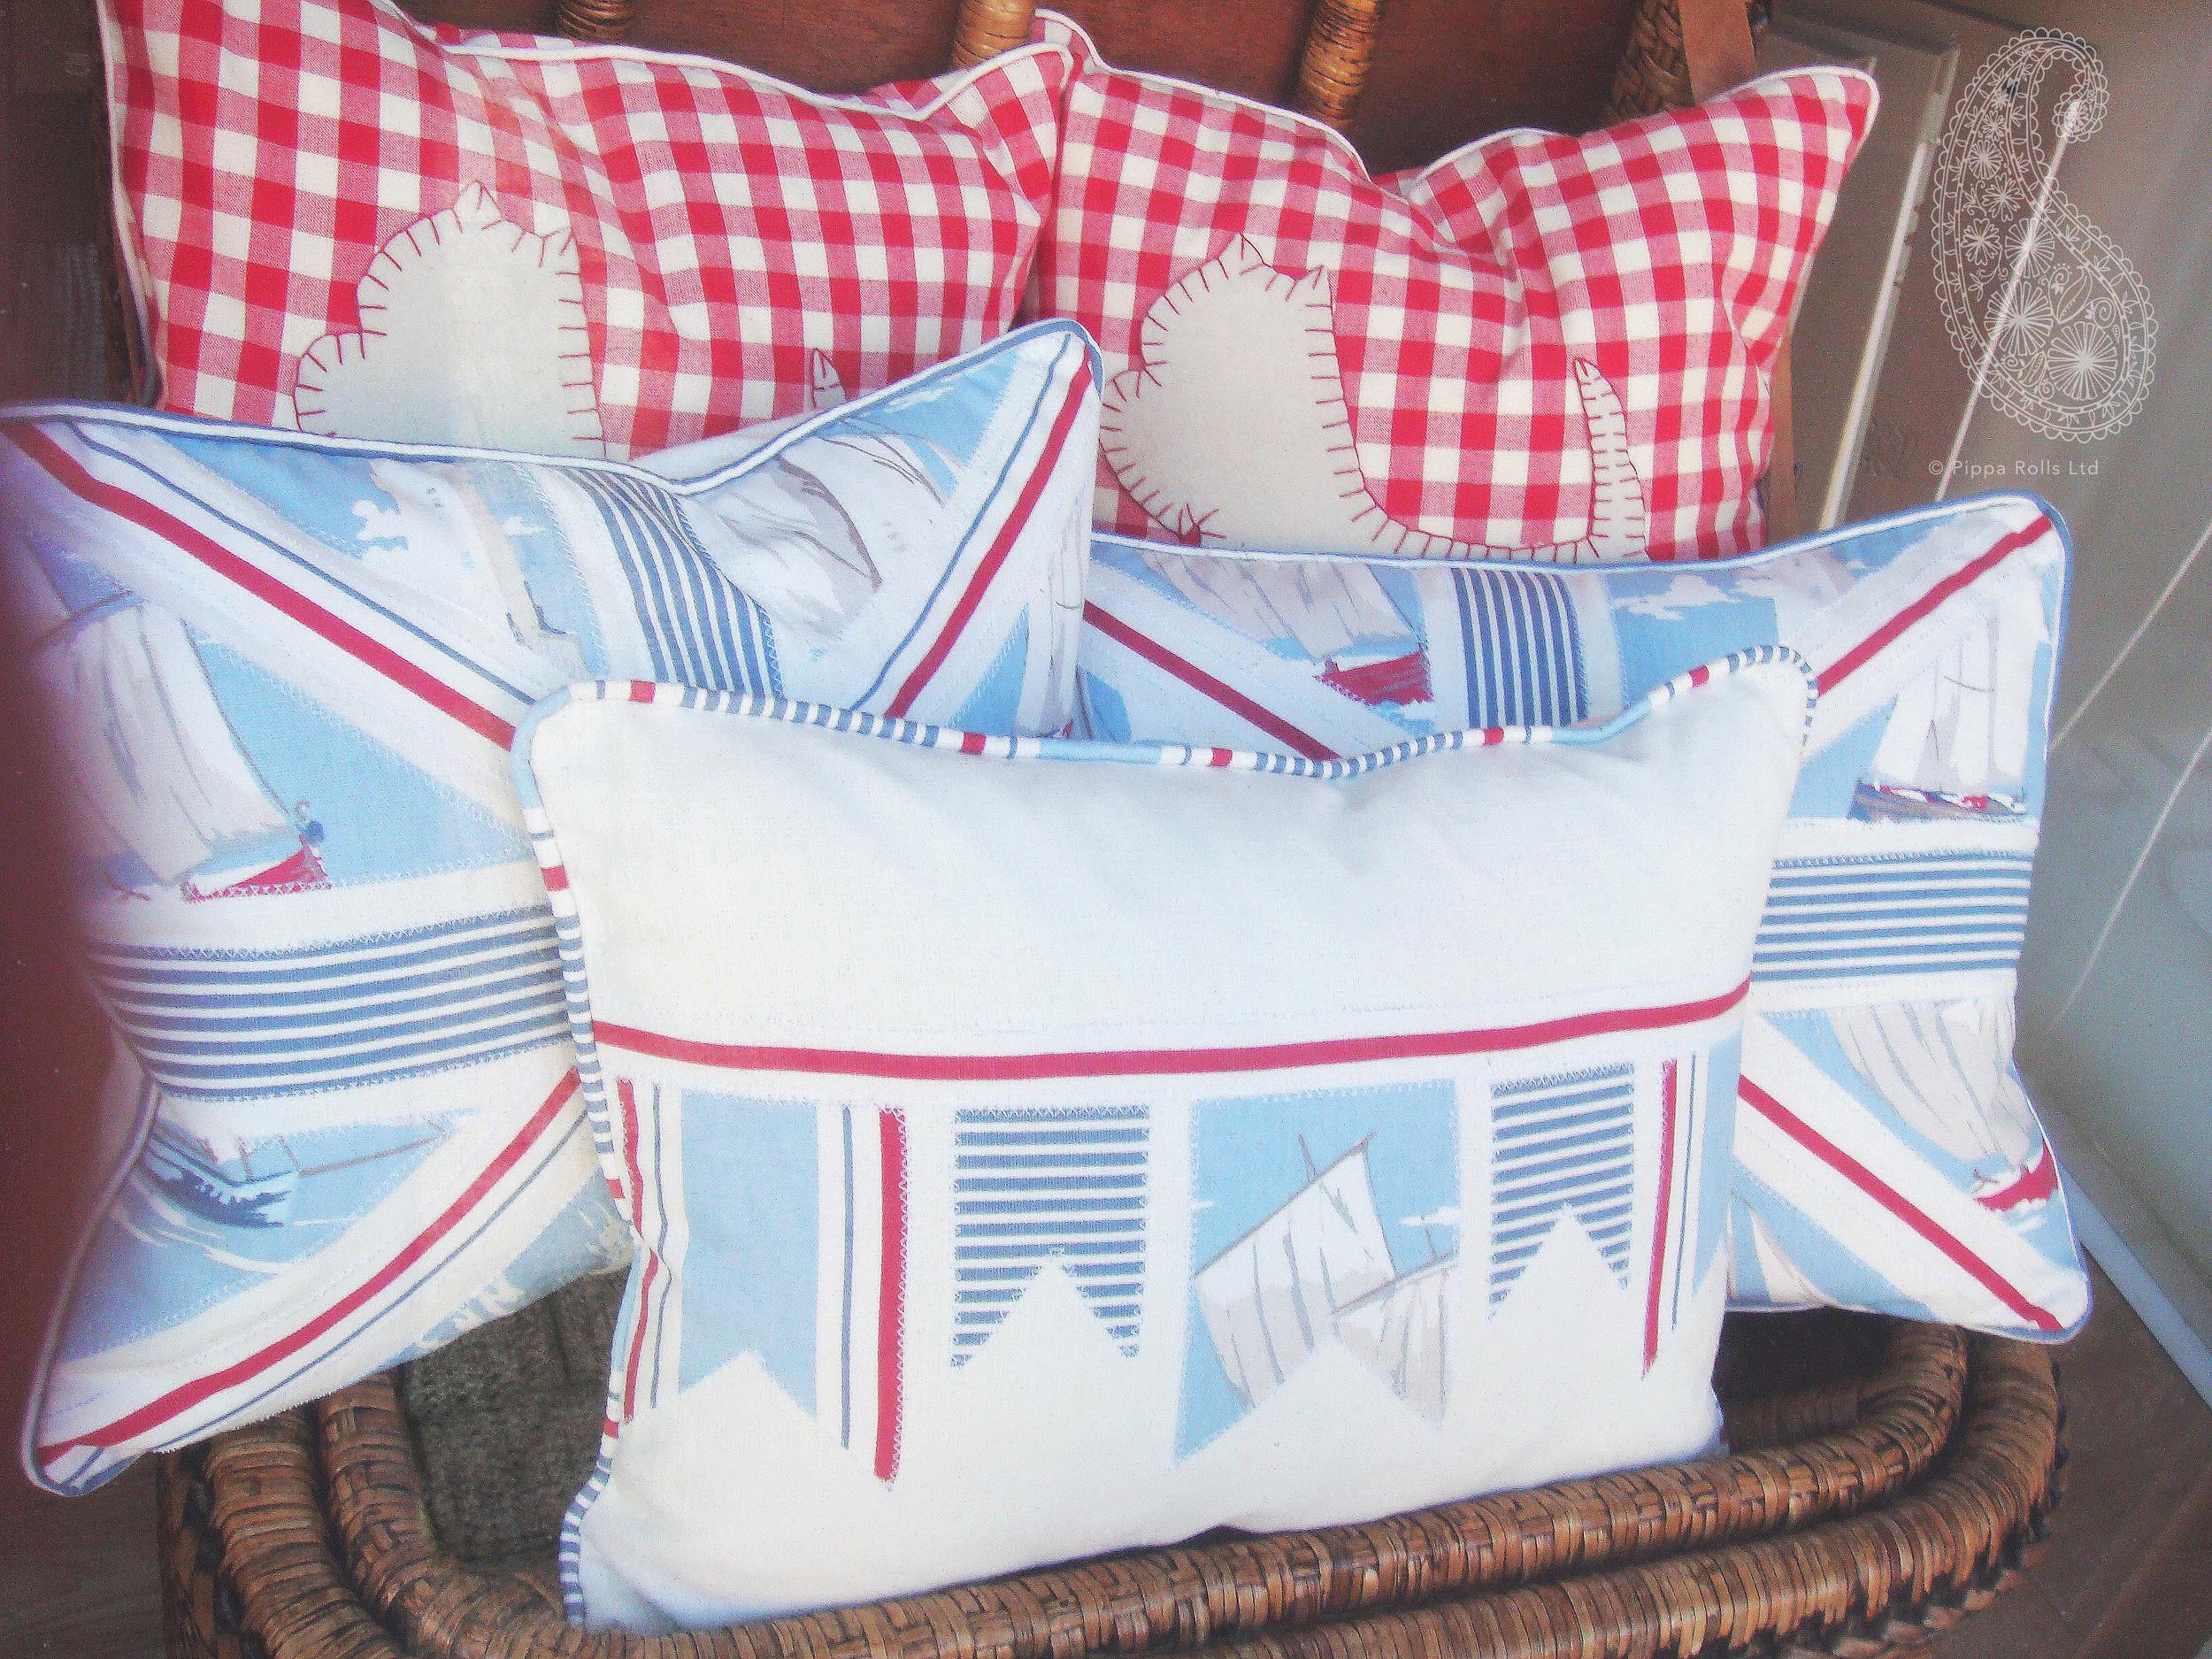 Union Jack cushions Pippa Rolls Limited jpeg.jpg